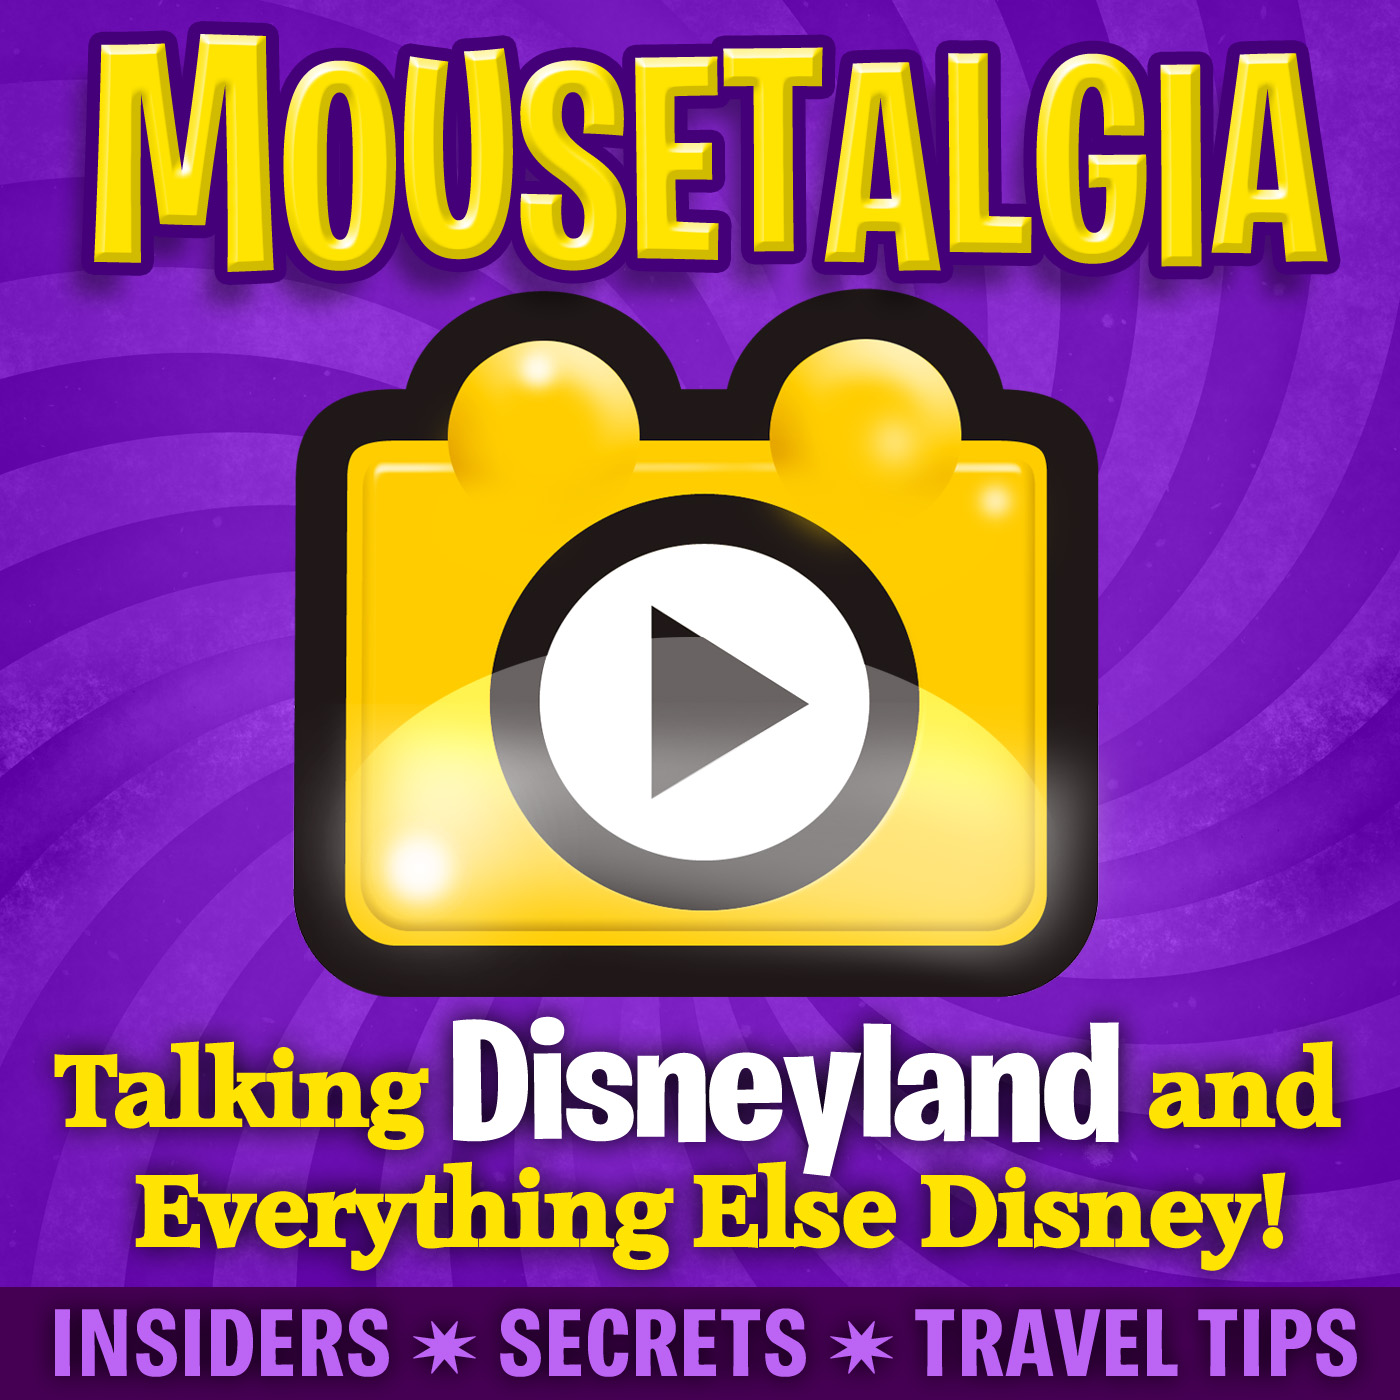 Mousetalgia! - Your Disneyland Podcast show art